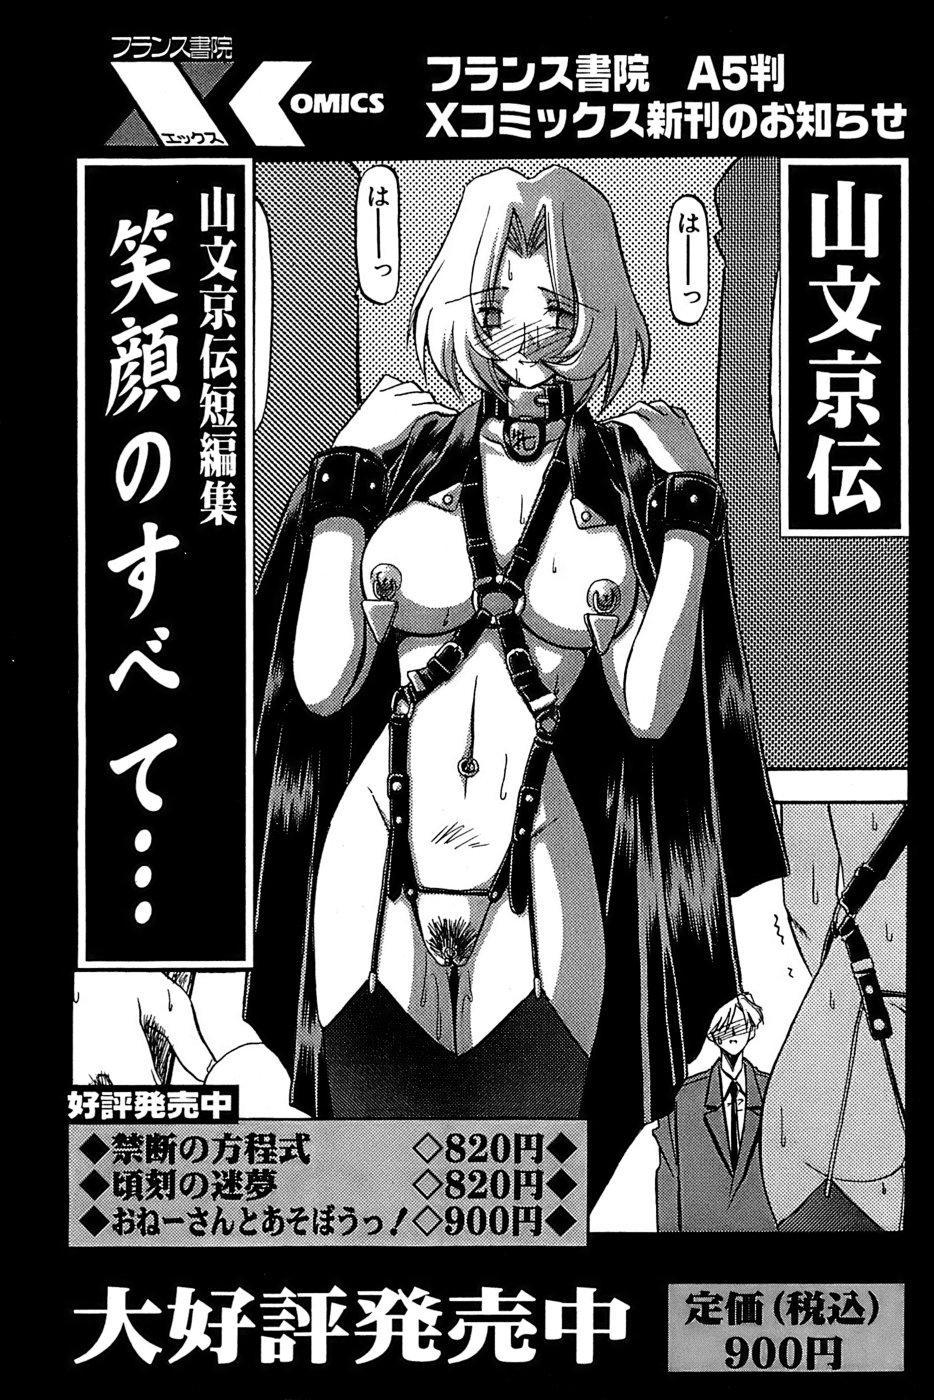 Comic Papipo 2007-04 52